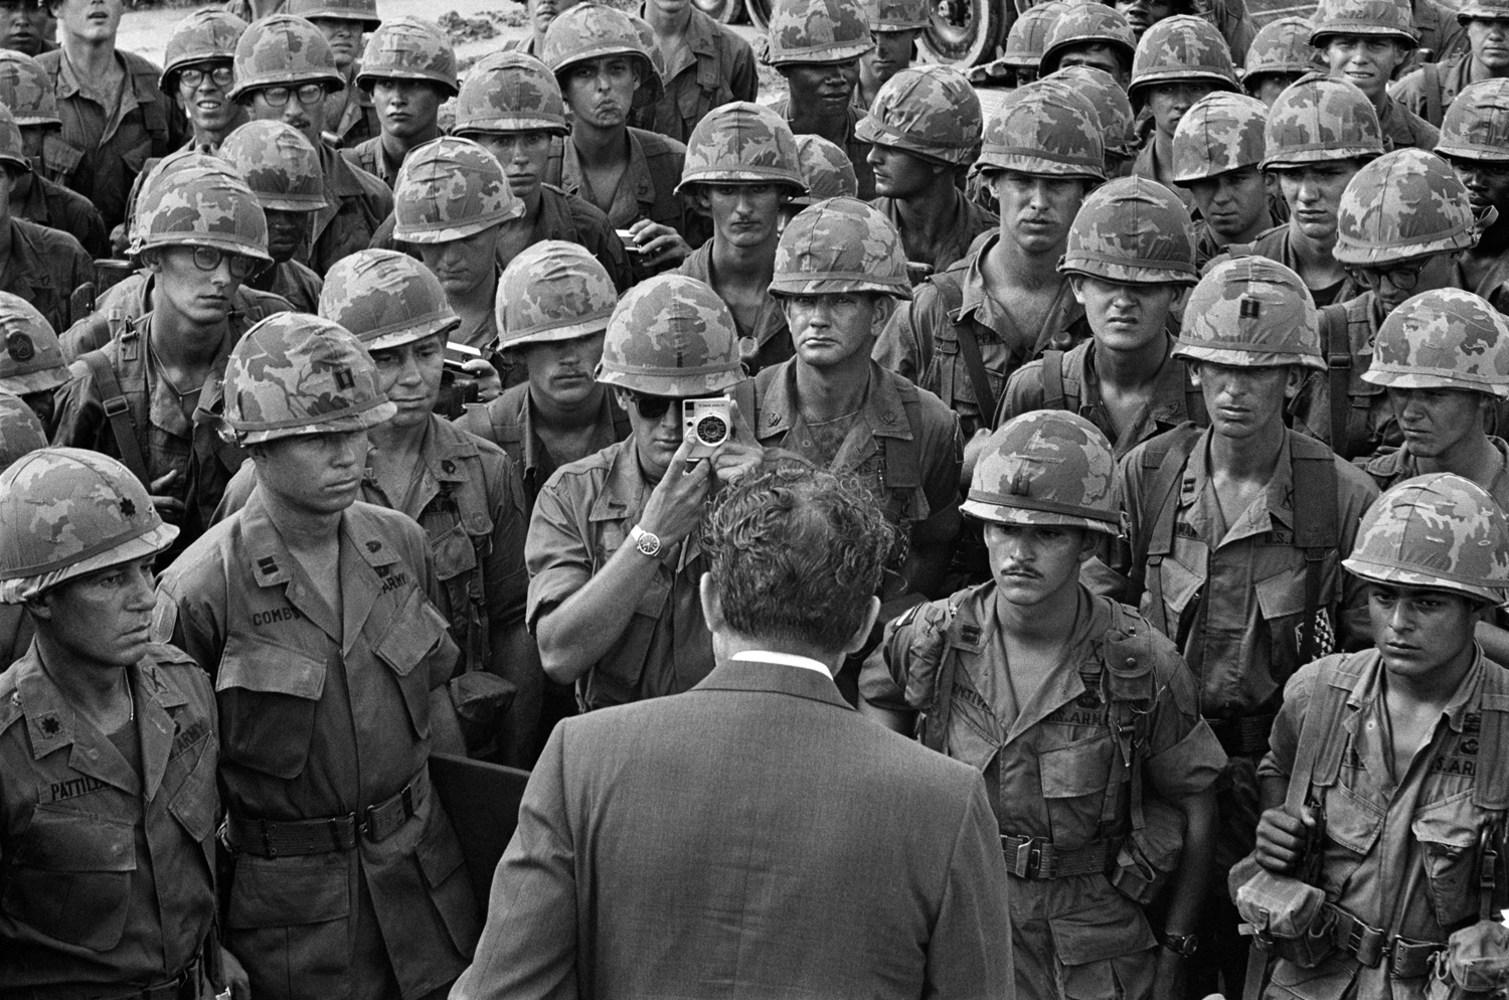 vietnam war - photo #39